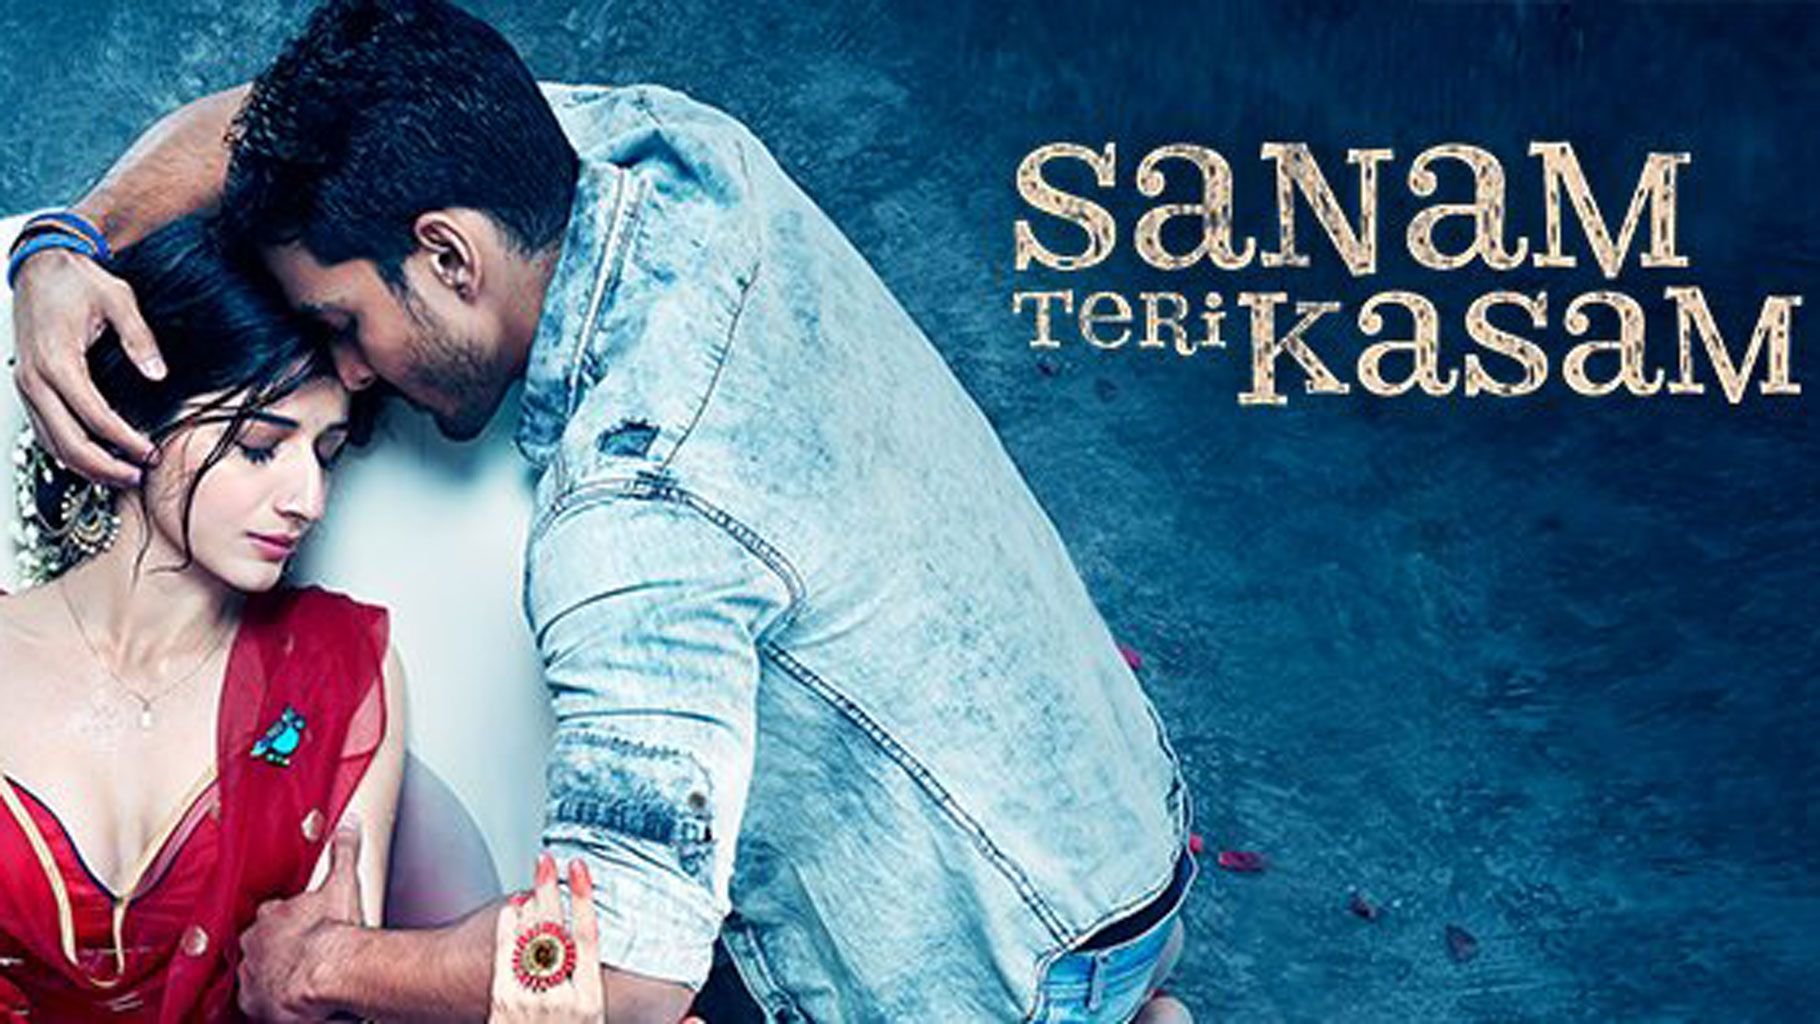 sanam-teri-kasam-movie-free-download | Romantic Movies | Pinterest ...